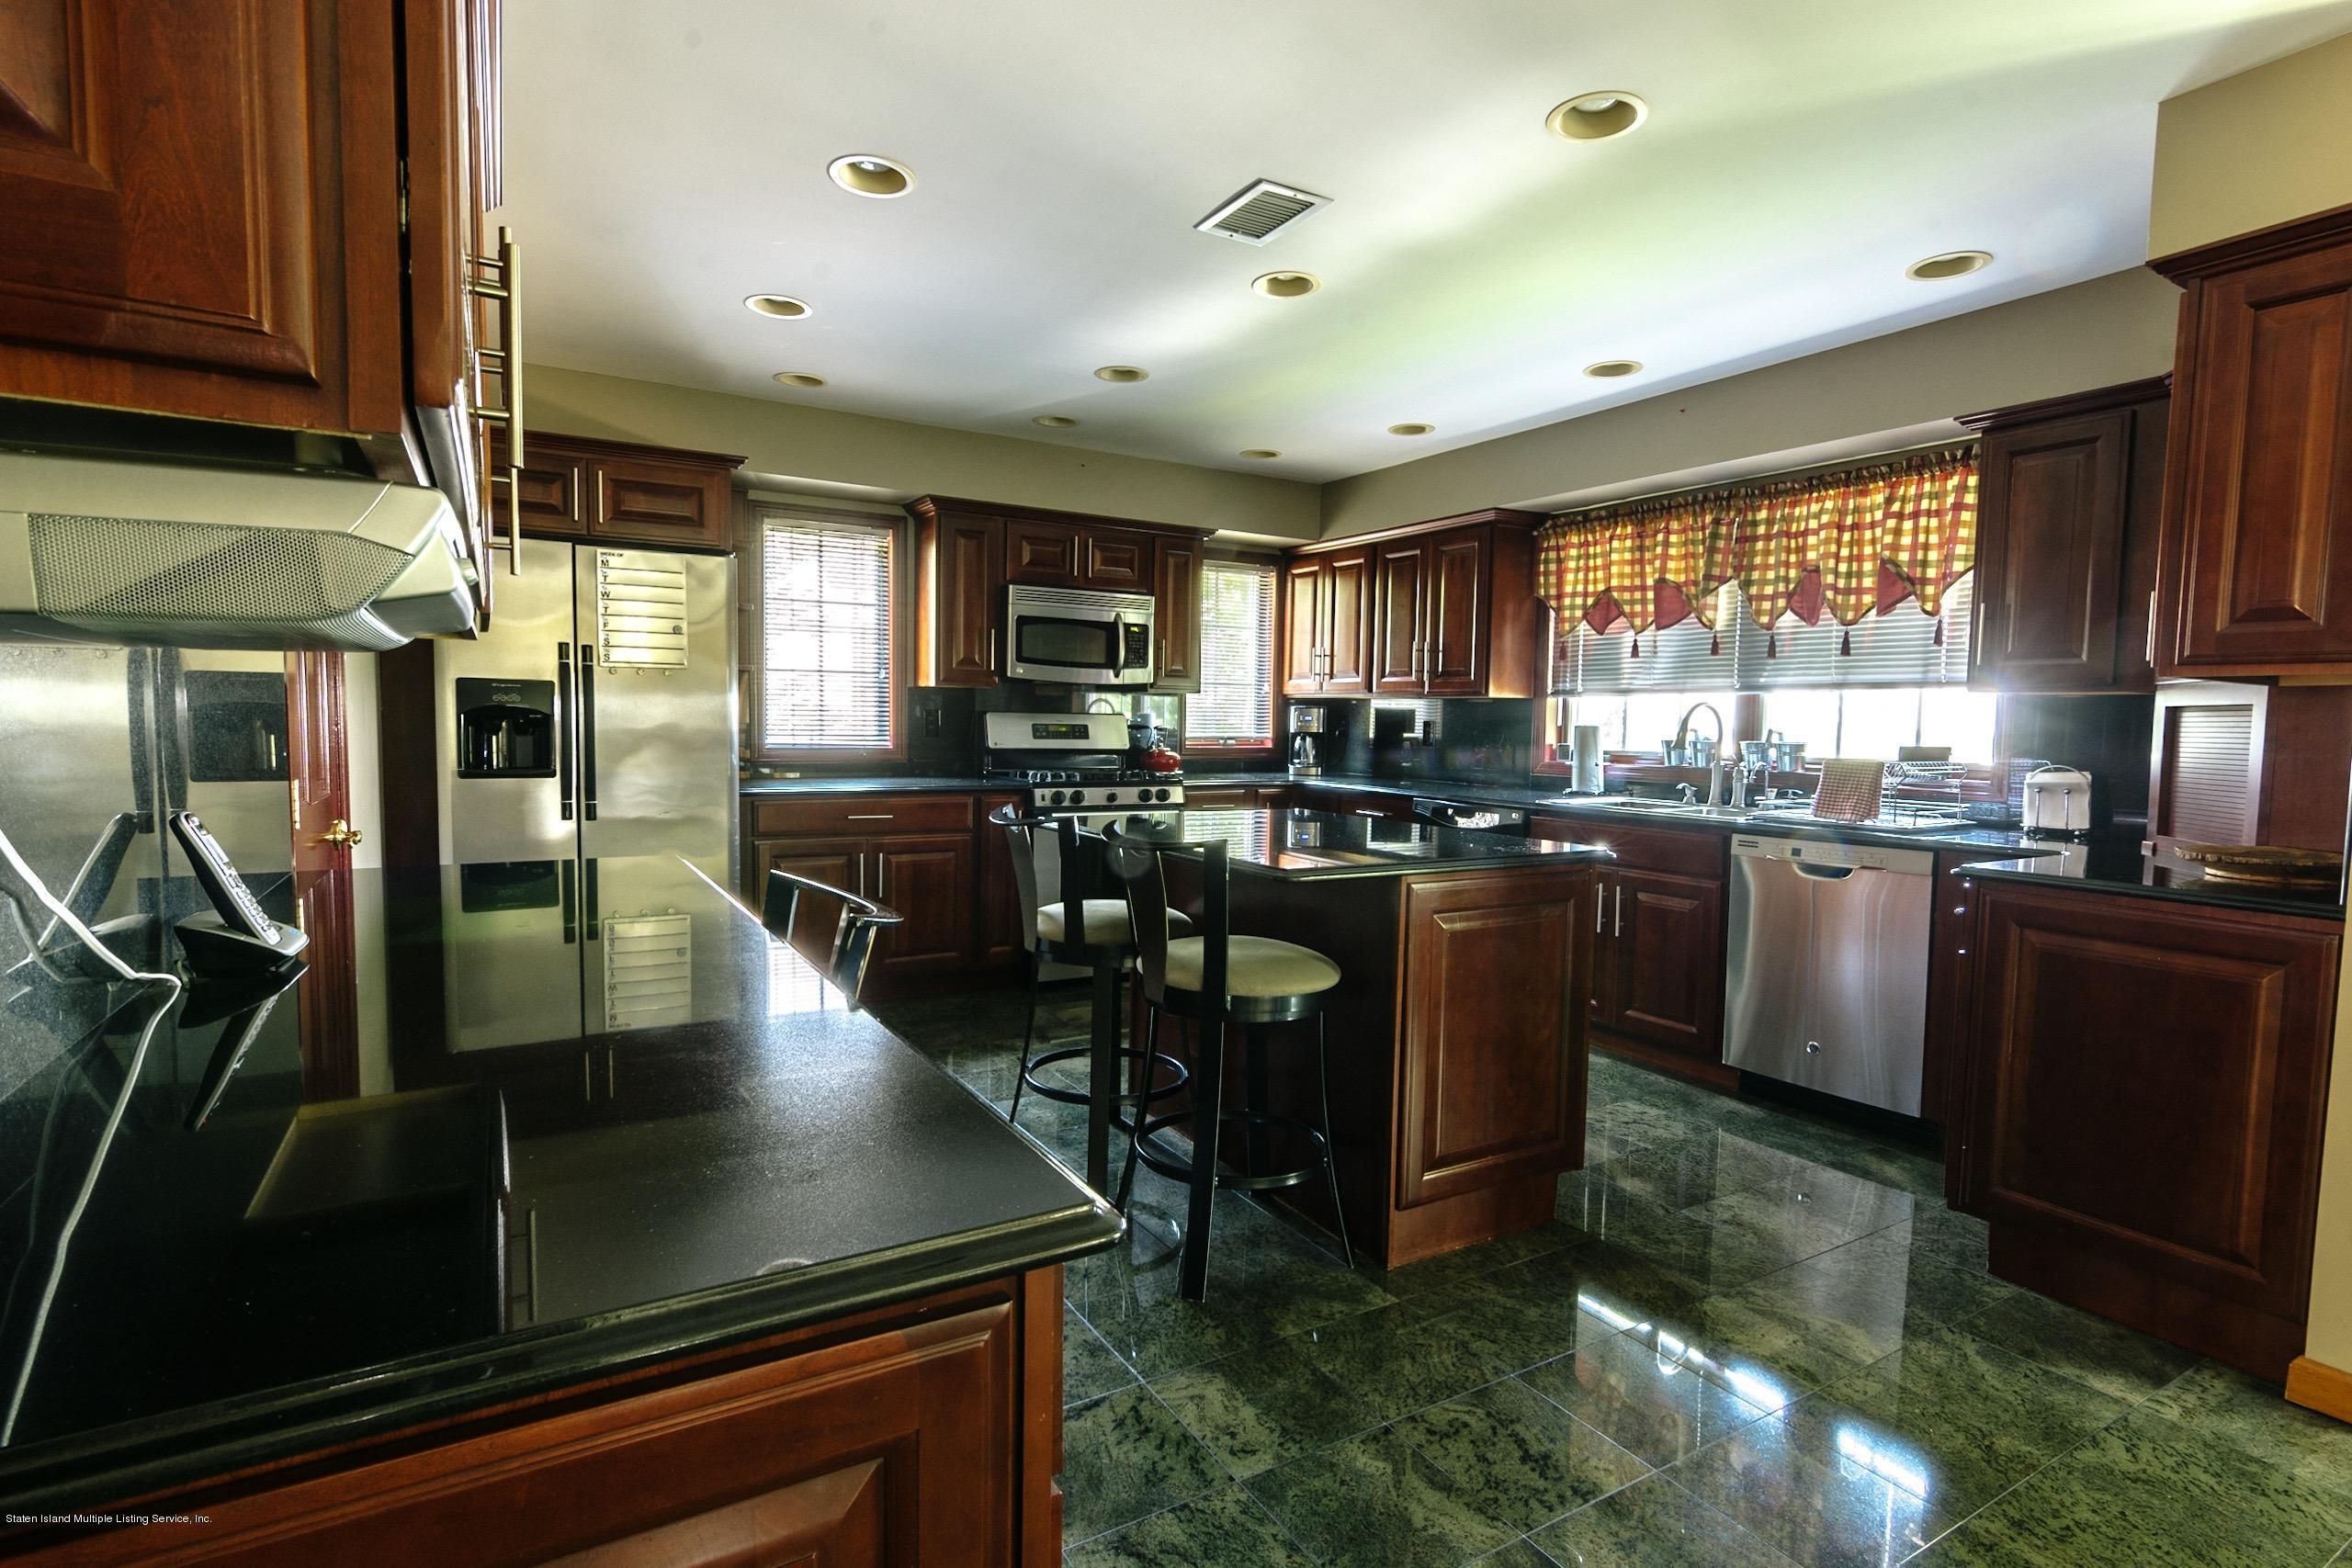 Single Family - Detached 120 Milden Avenue  Staten Island, NY 10301, MLS-1121068-5